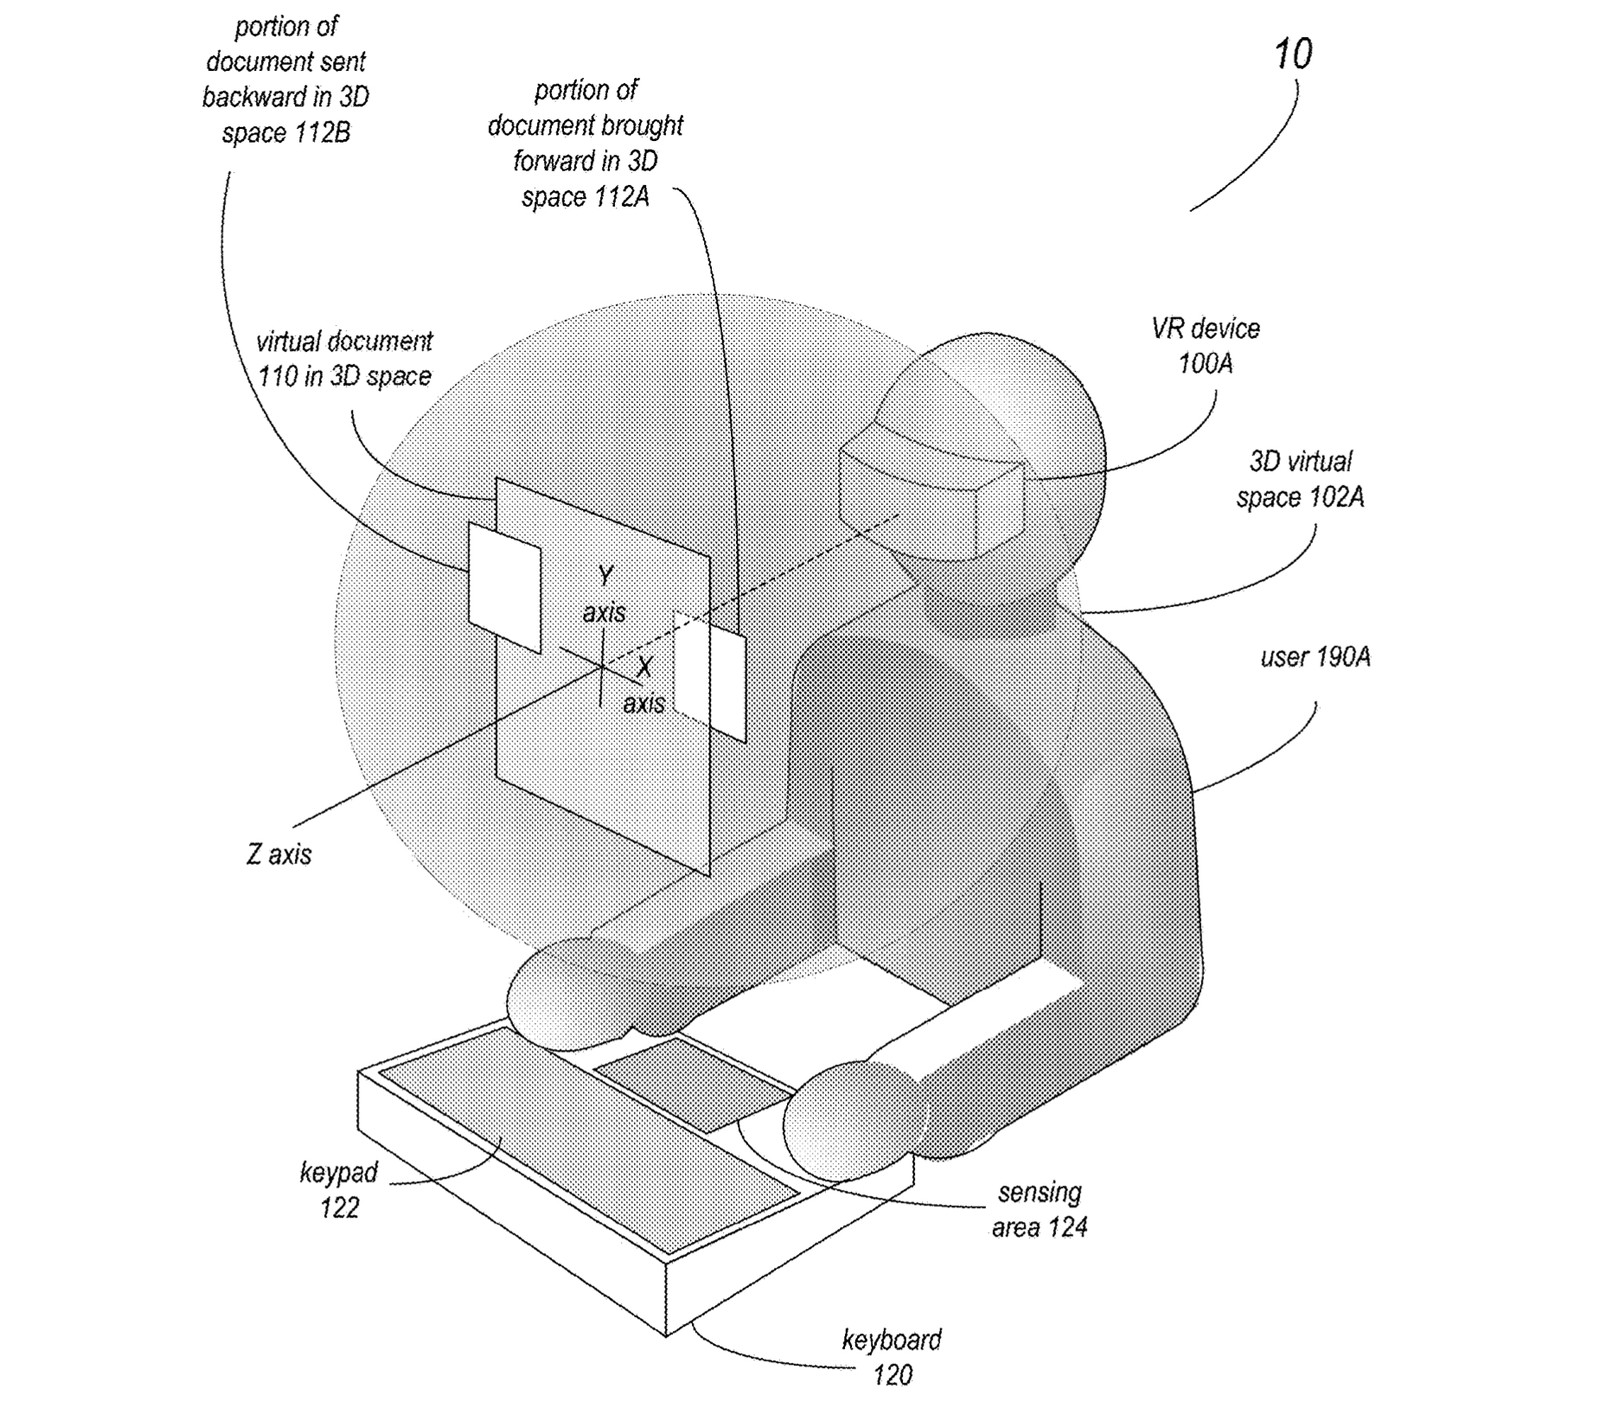 headset-patent-document-software.jpg